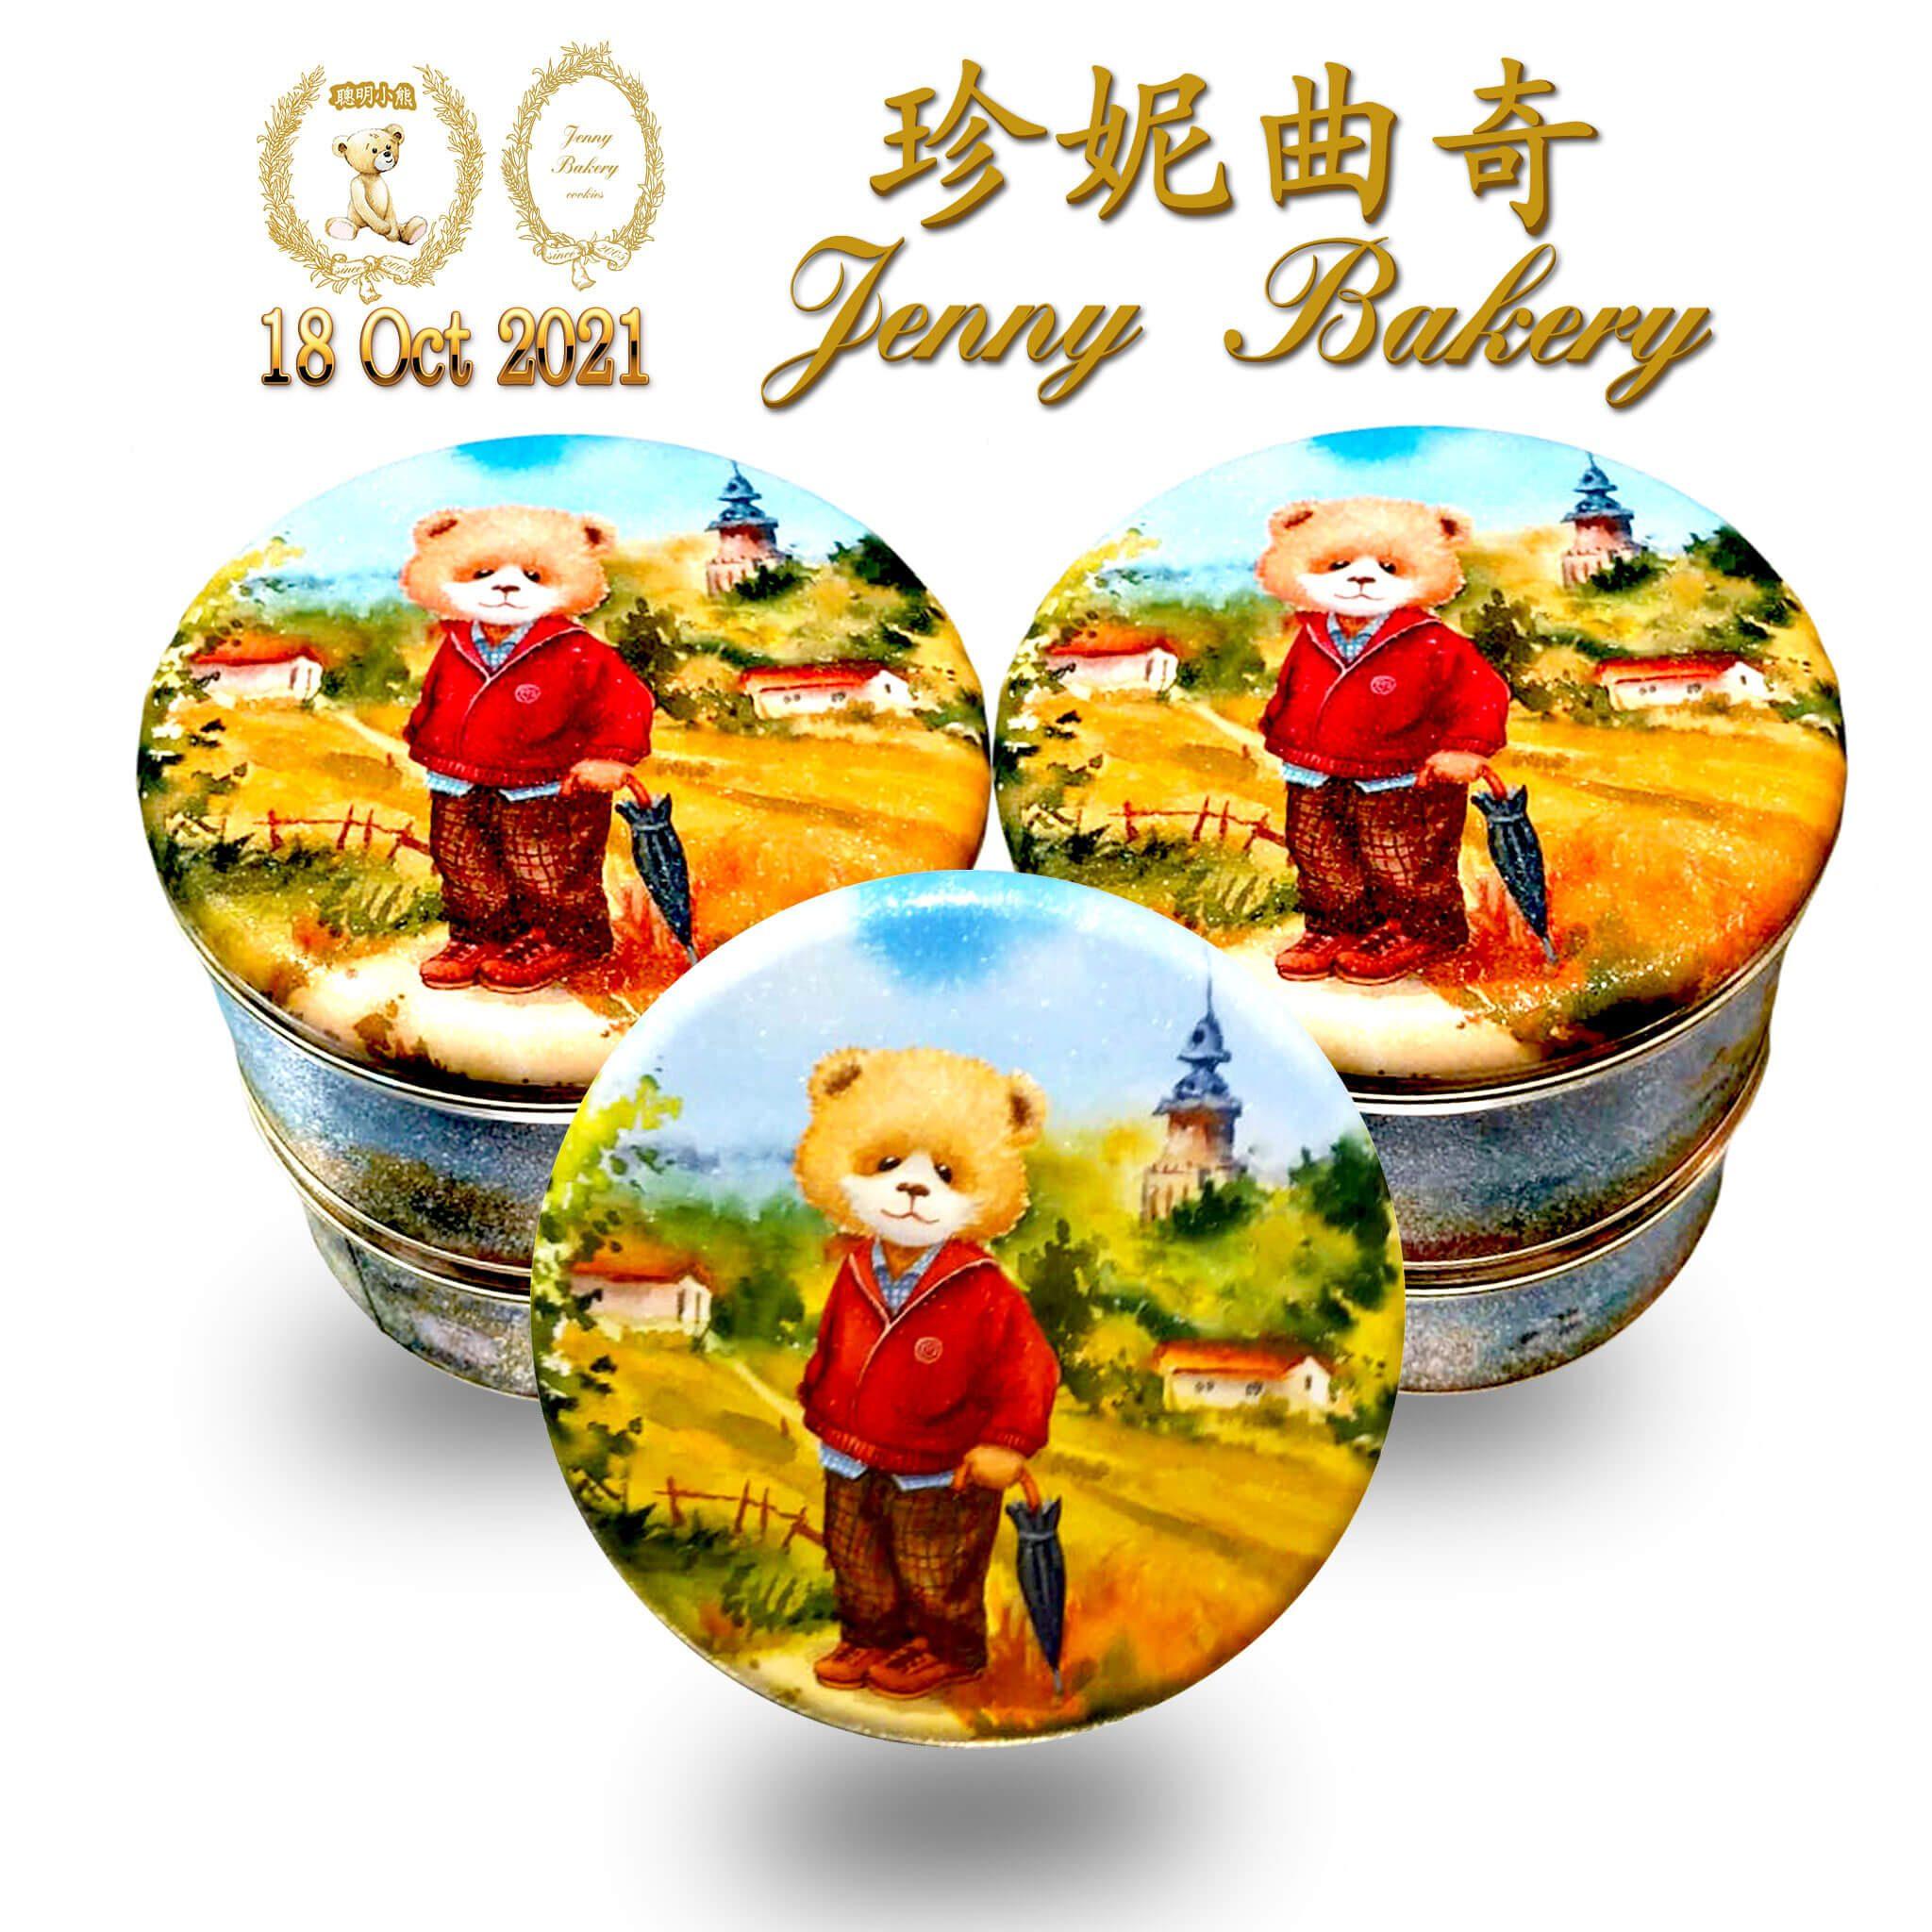 Jenny Bakery Hong Kong   Design20211018 Fashion Village